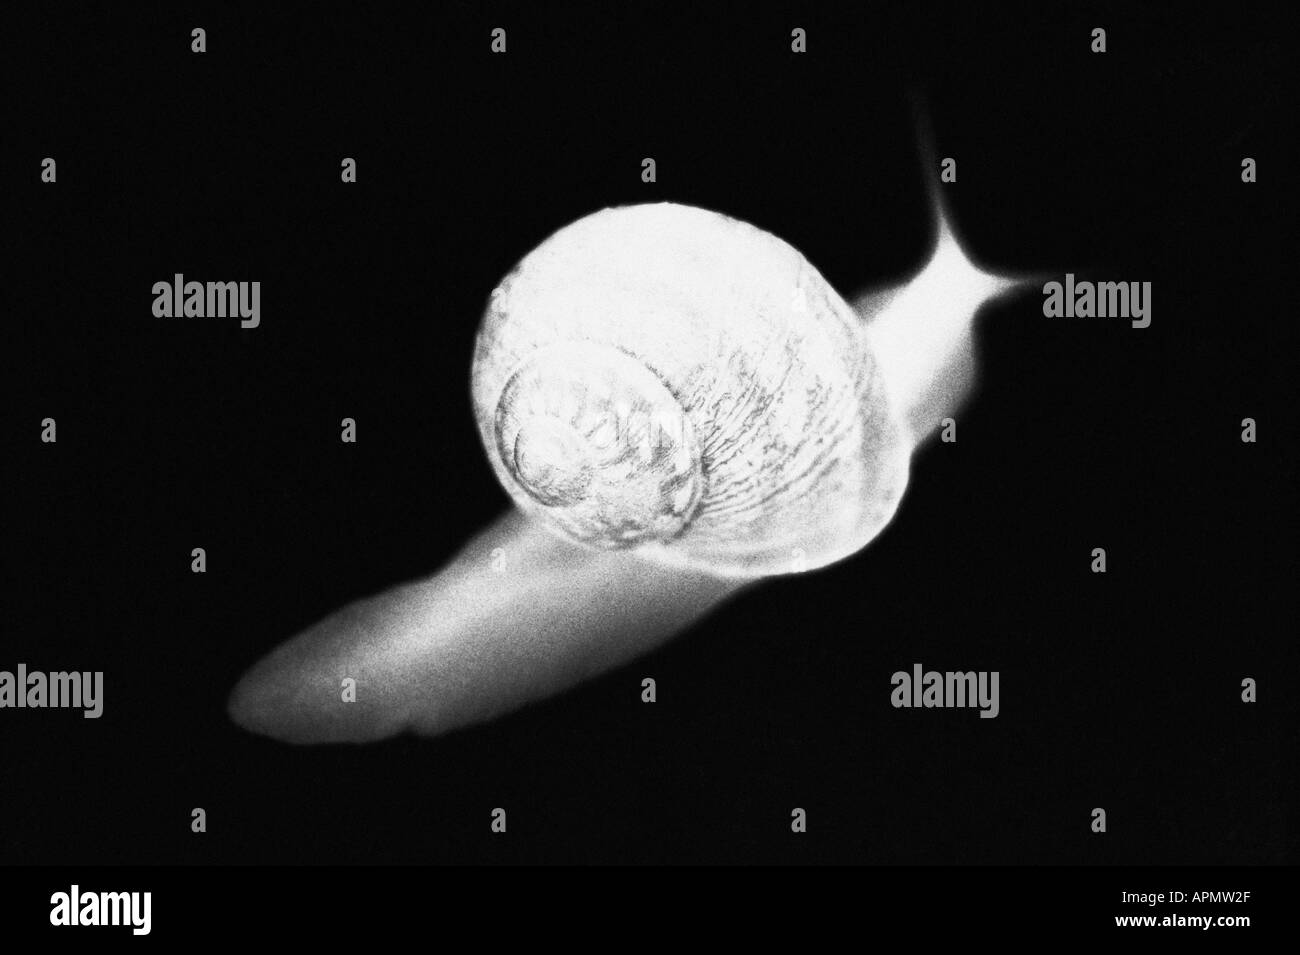 Radiograph of snail - Stock Image